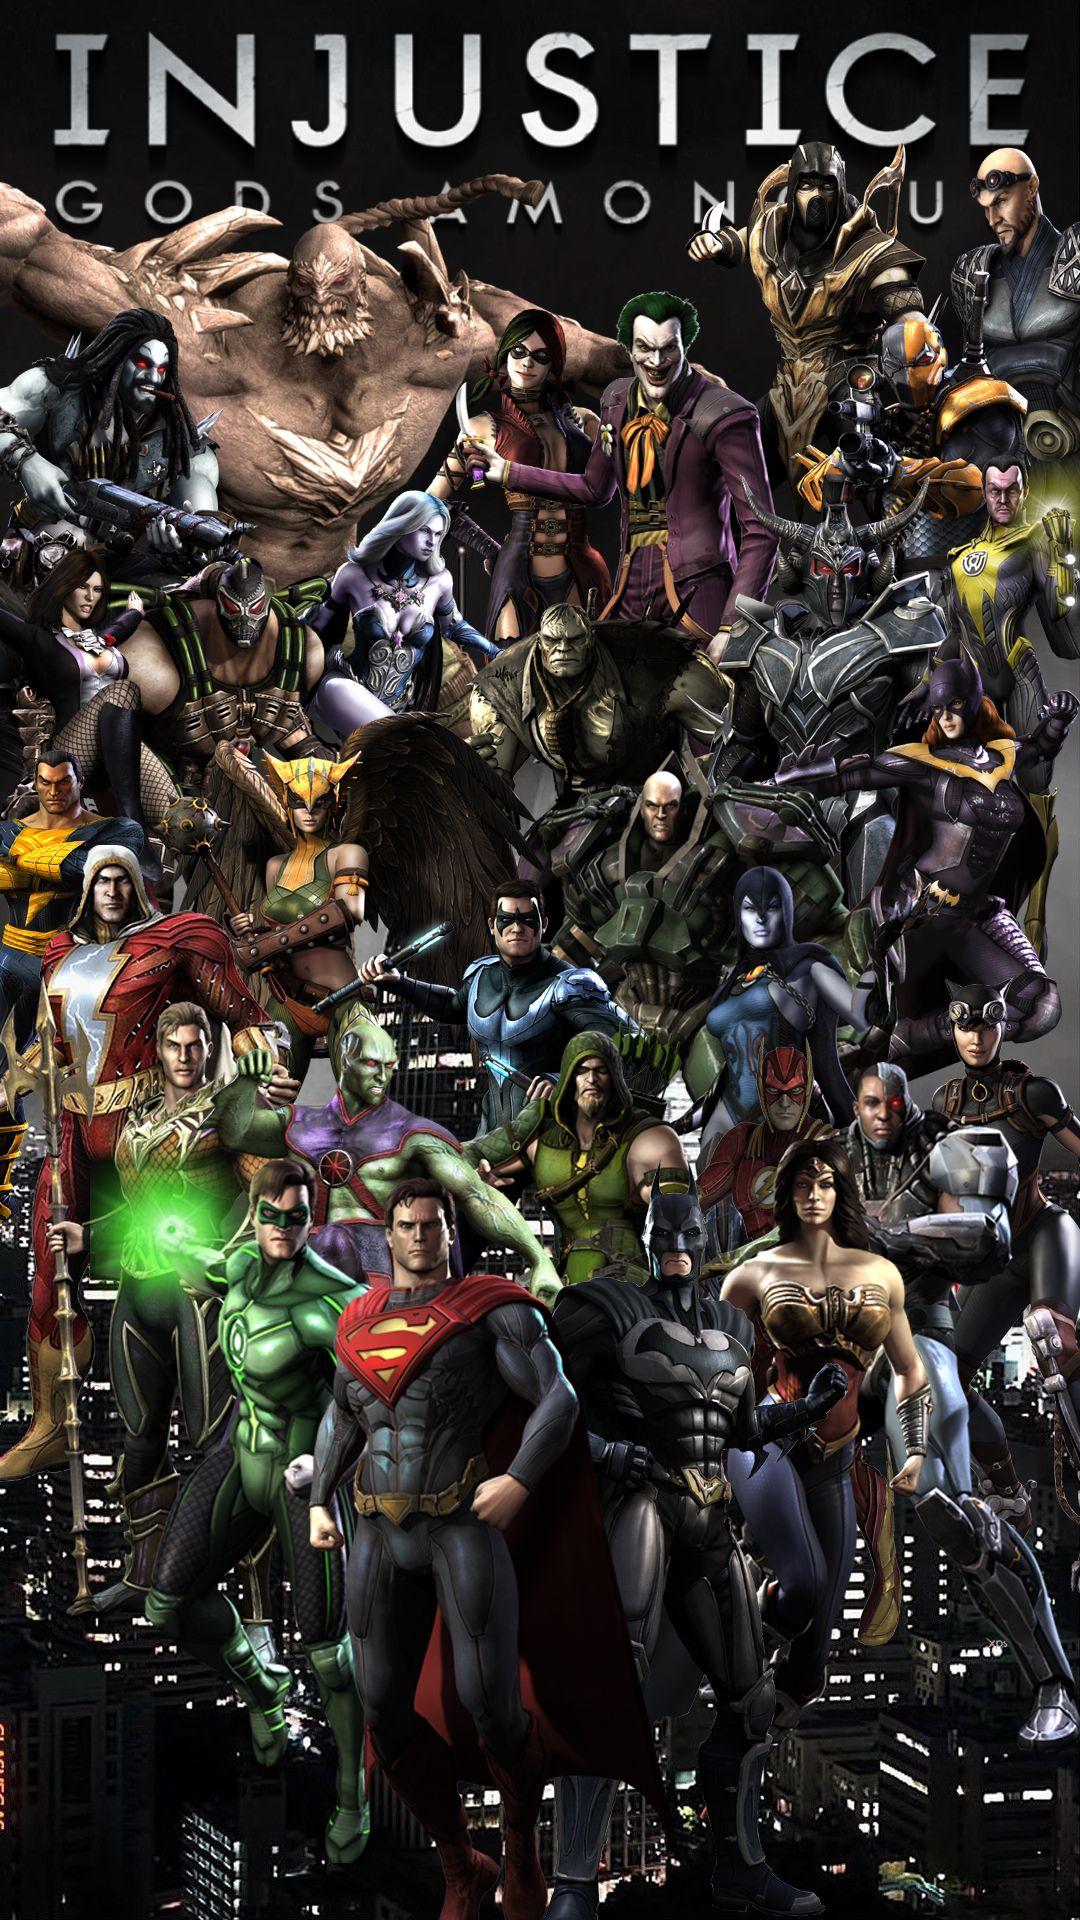 Injustice Gods Among Us Wallpaper For Smartphone Fondos De Comic